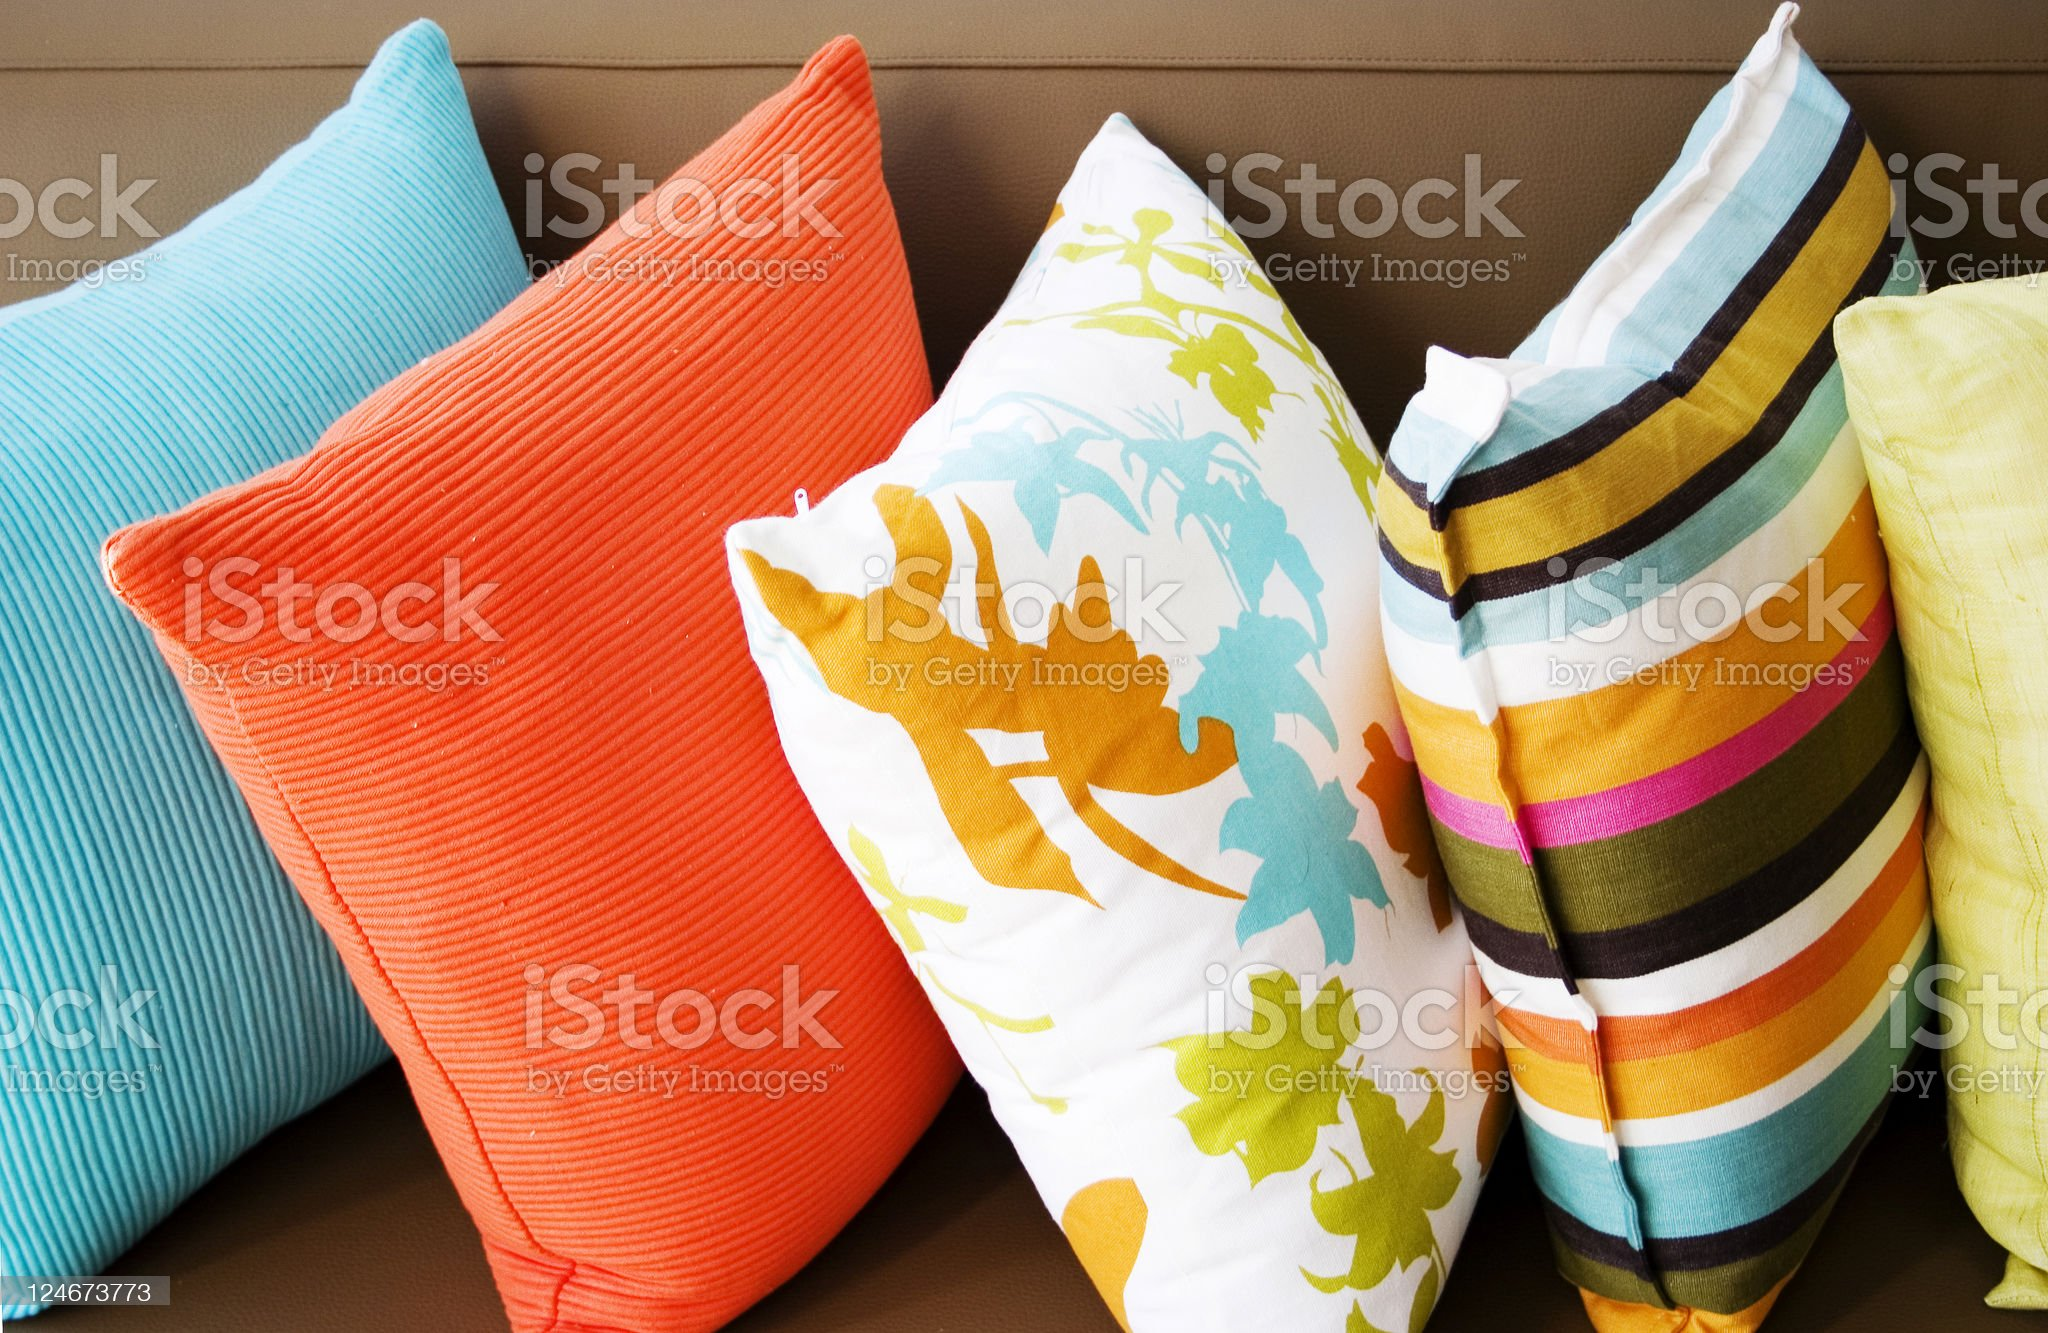 Cushions royalty-free stock photo